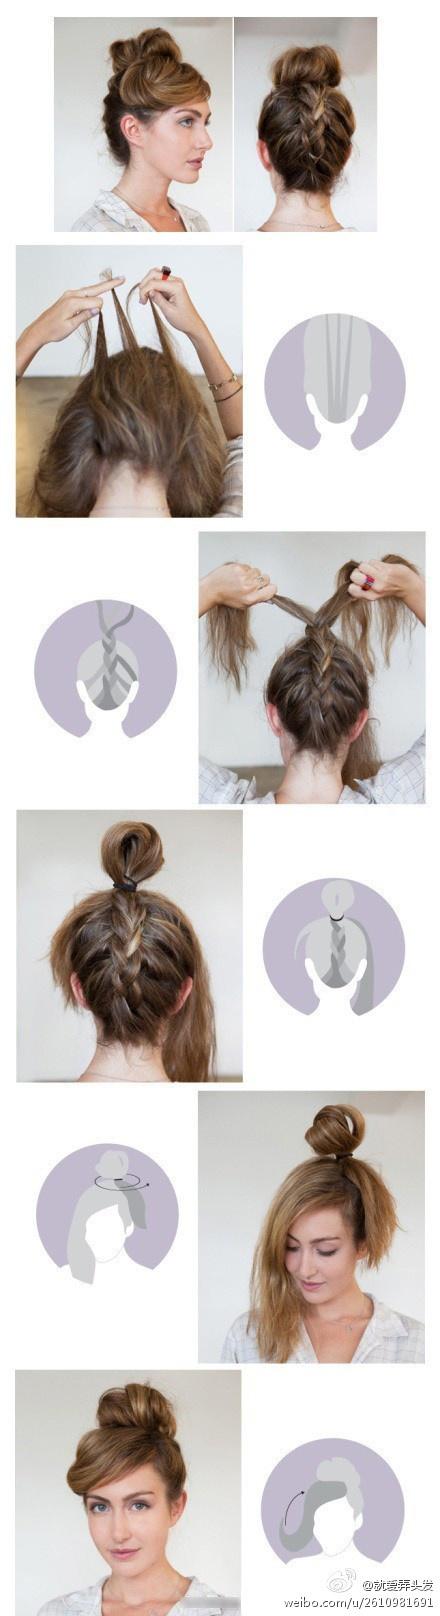 Messy bun w/ French braid